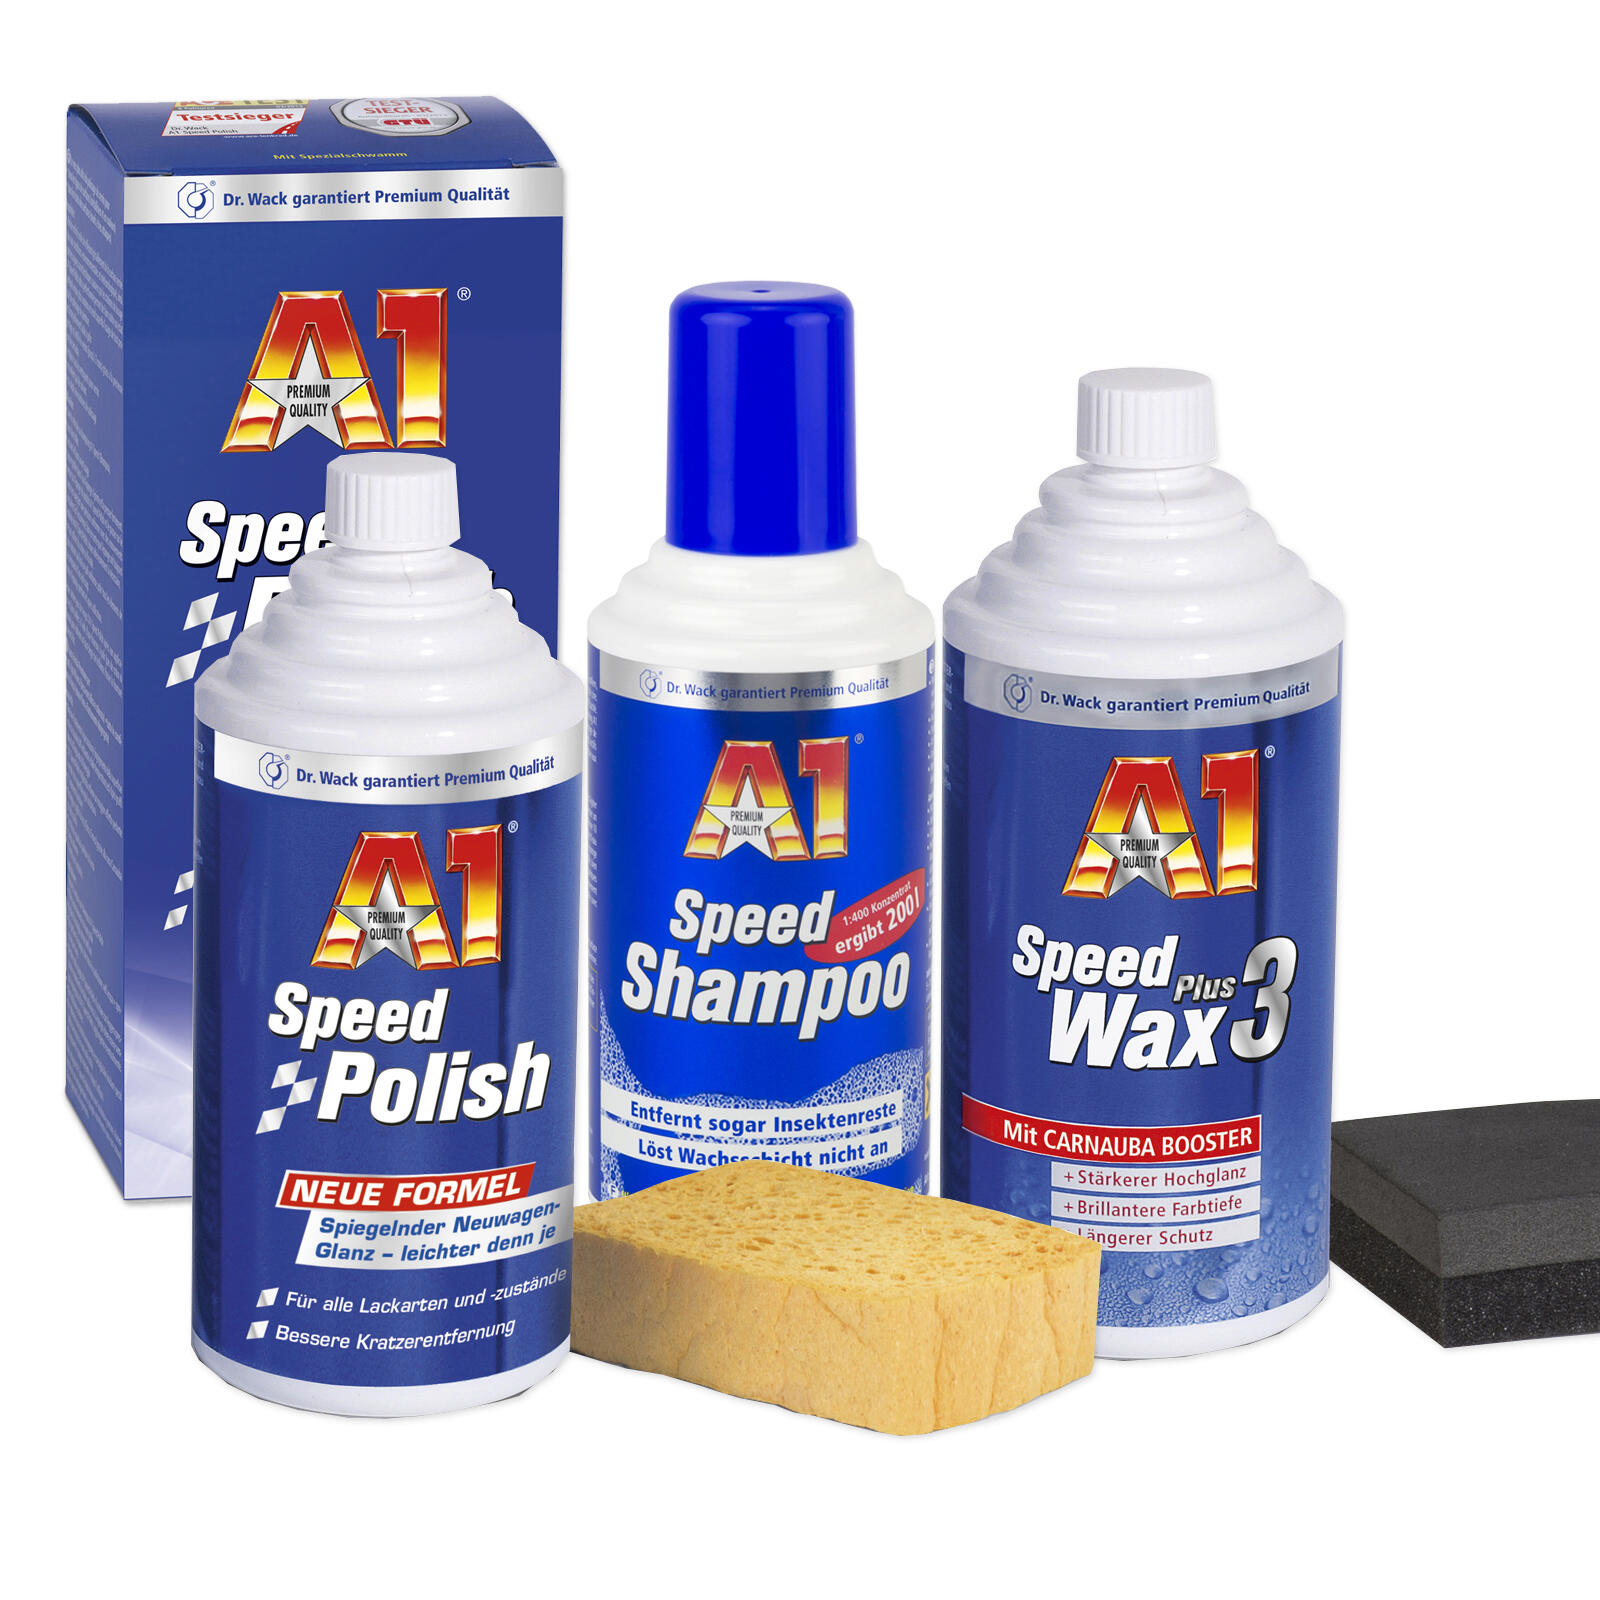 Dr. Wack Speed Set / Shampoo + Polish + Wax